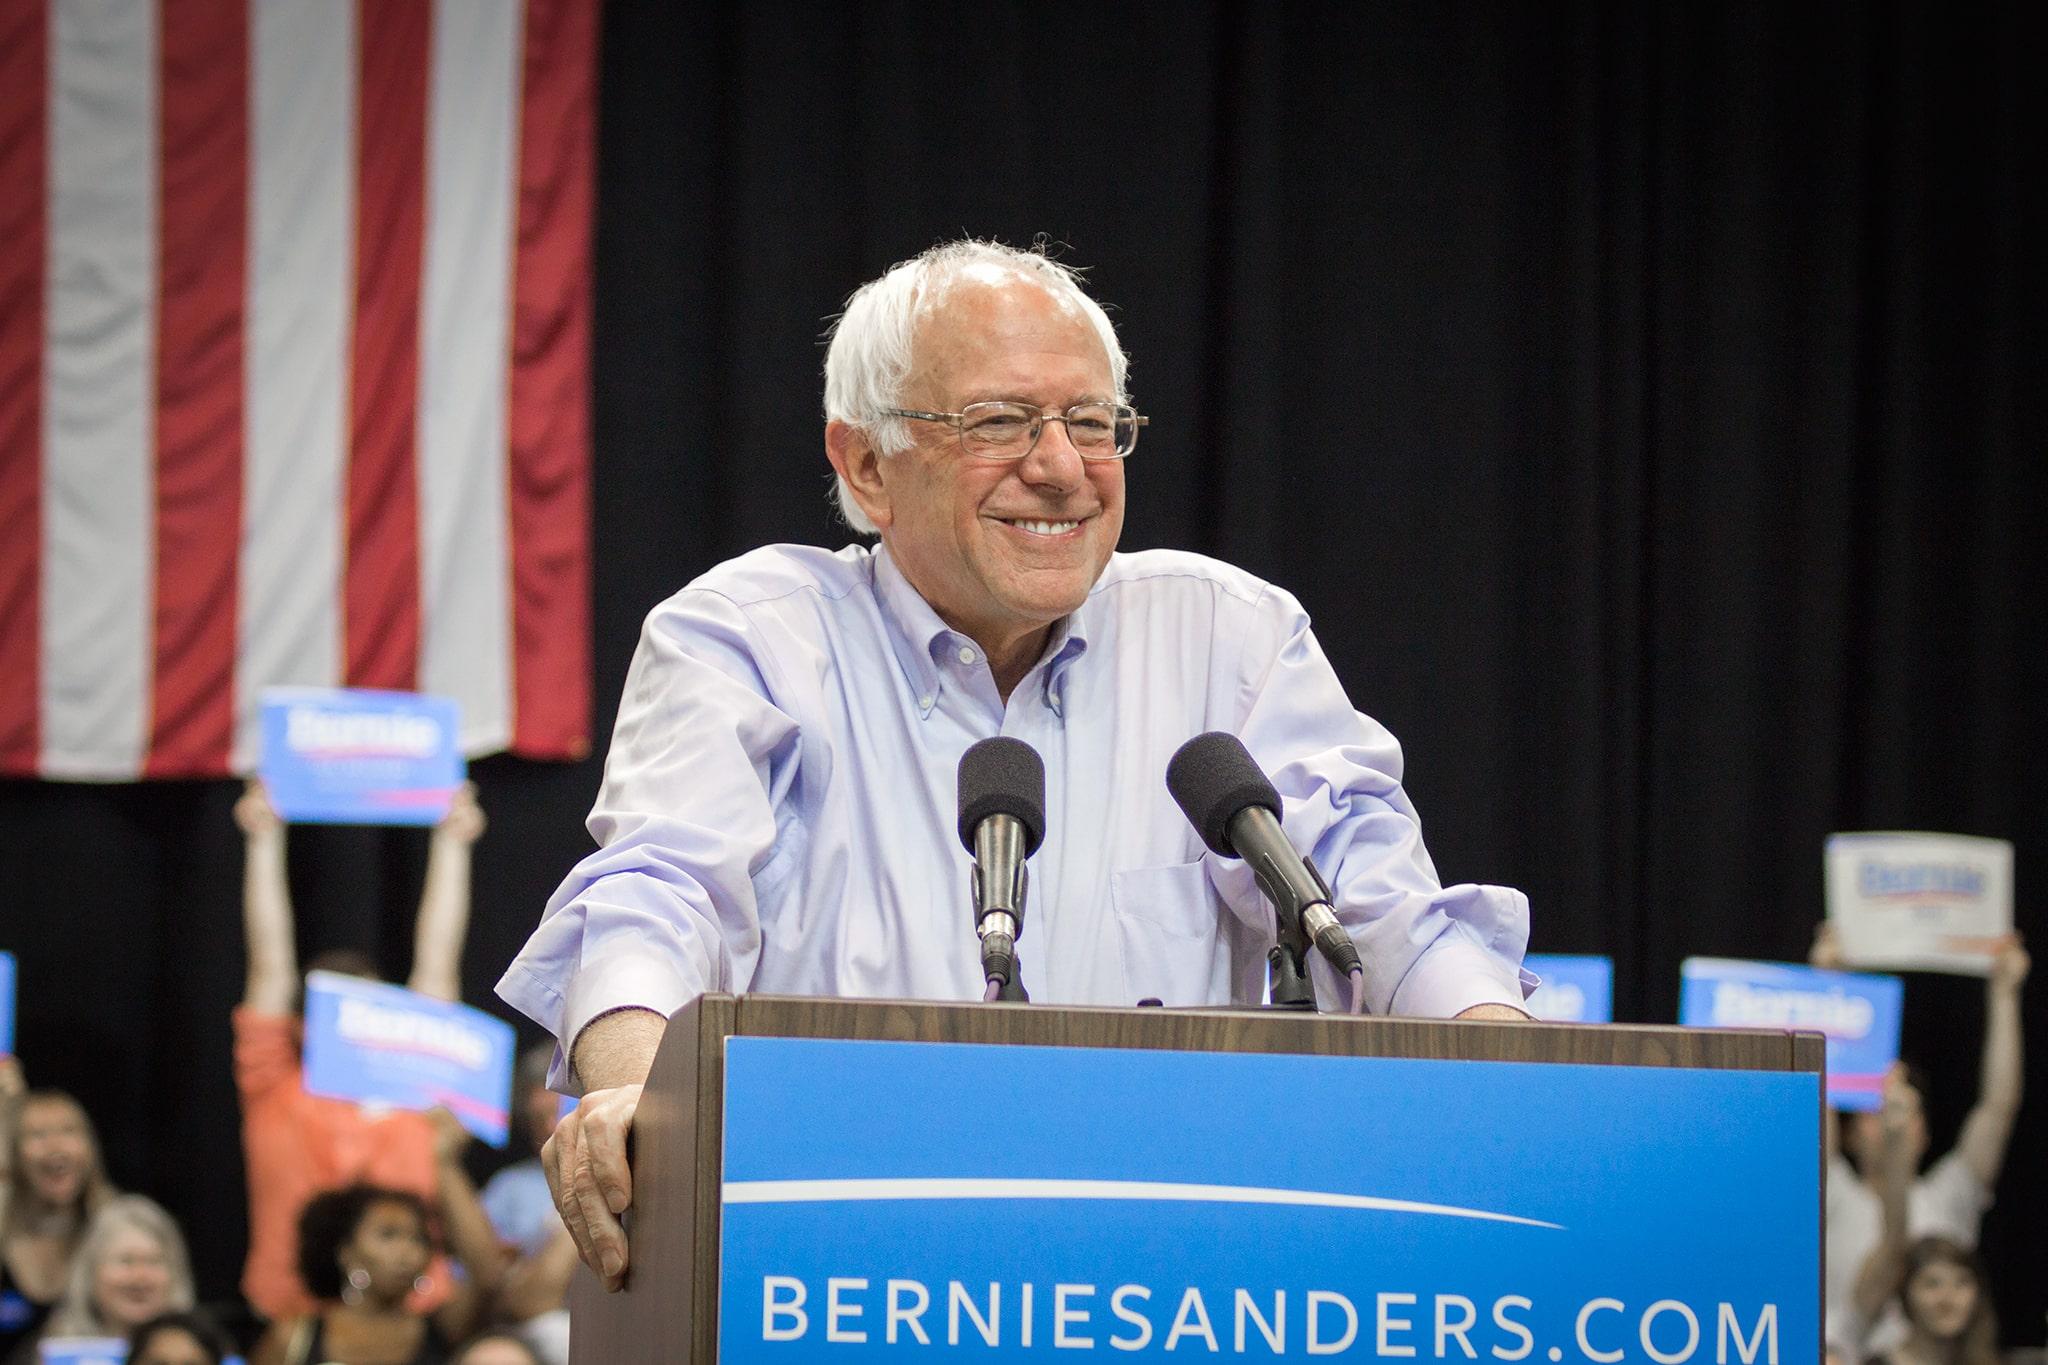 https://commons.wikimedia.org/wiki/File:Bernie_Sanders_(20033841412_24d8796e44_c0).jpg